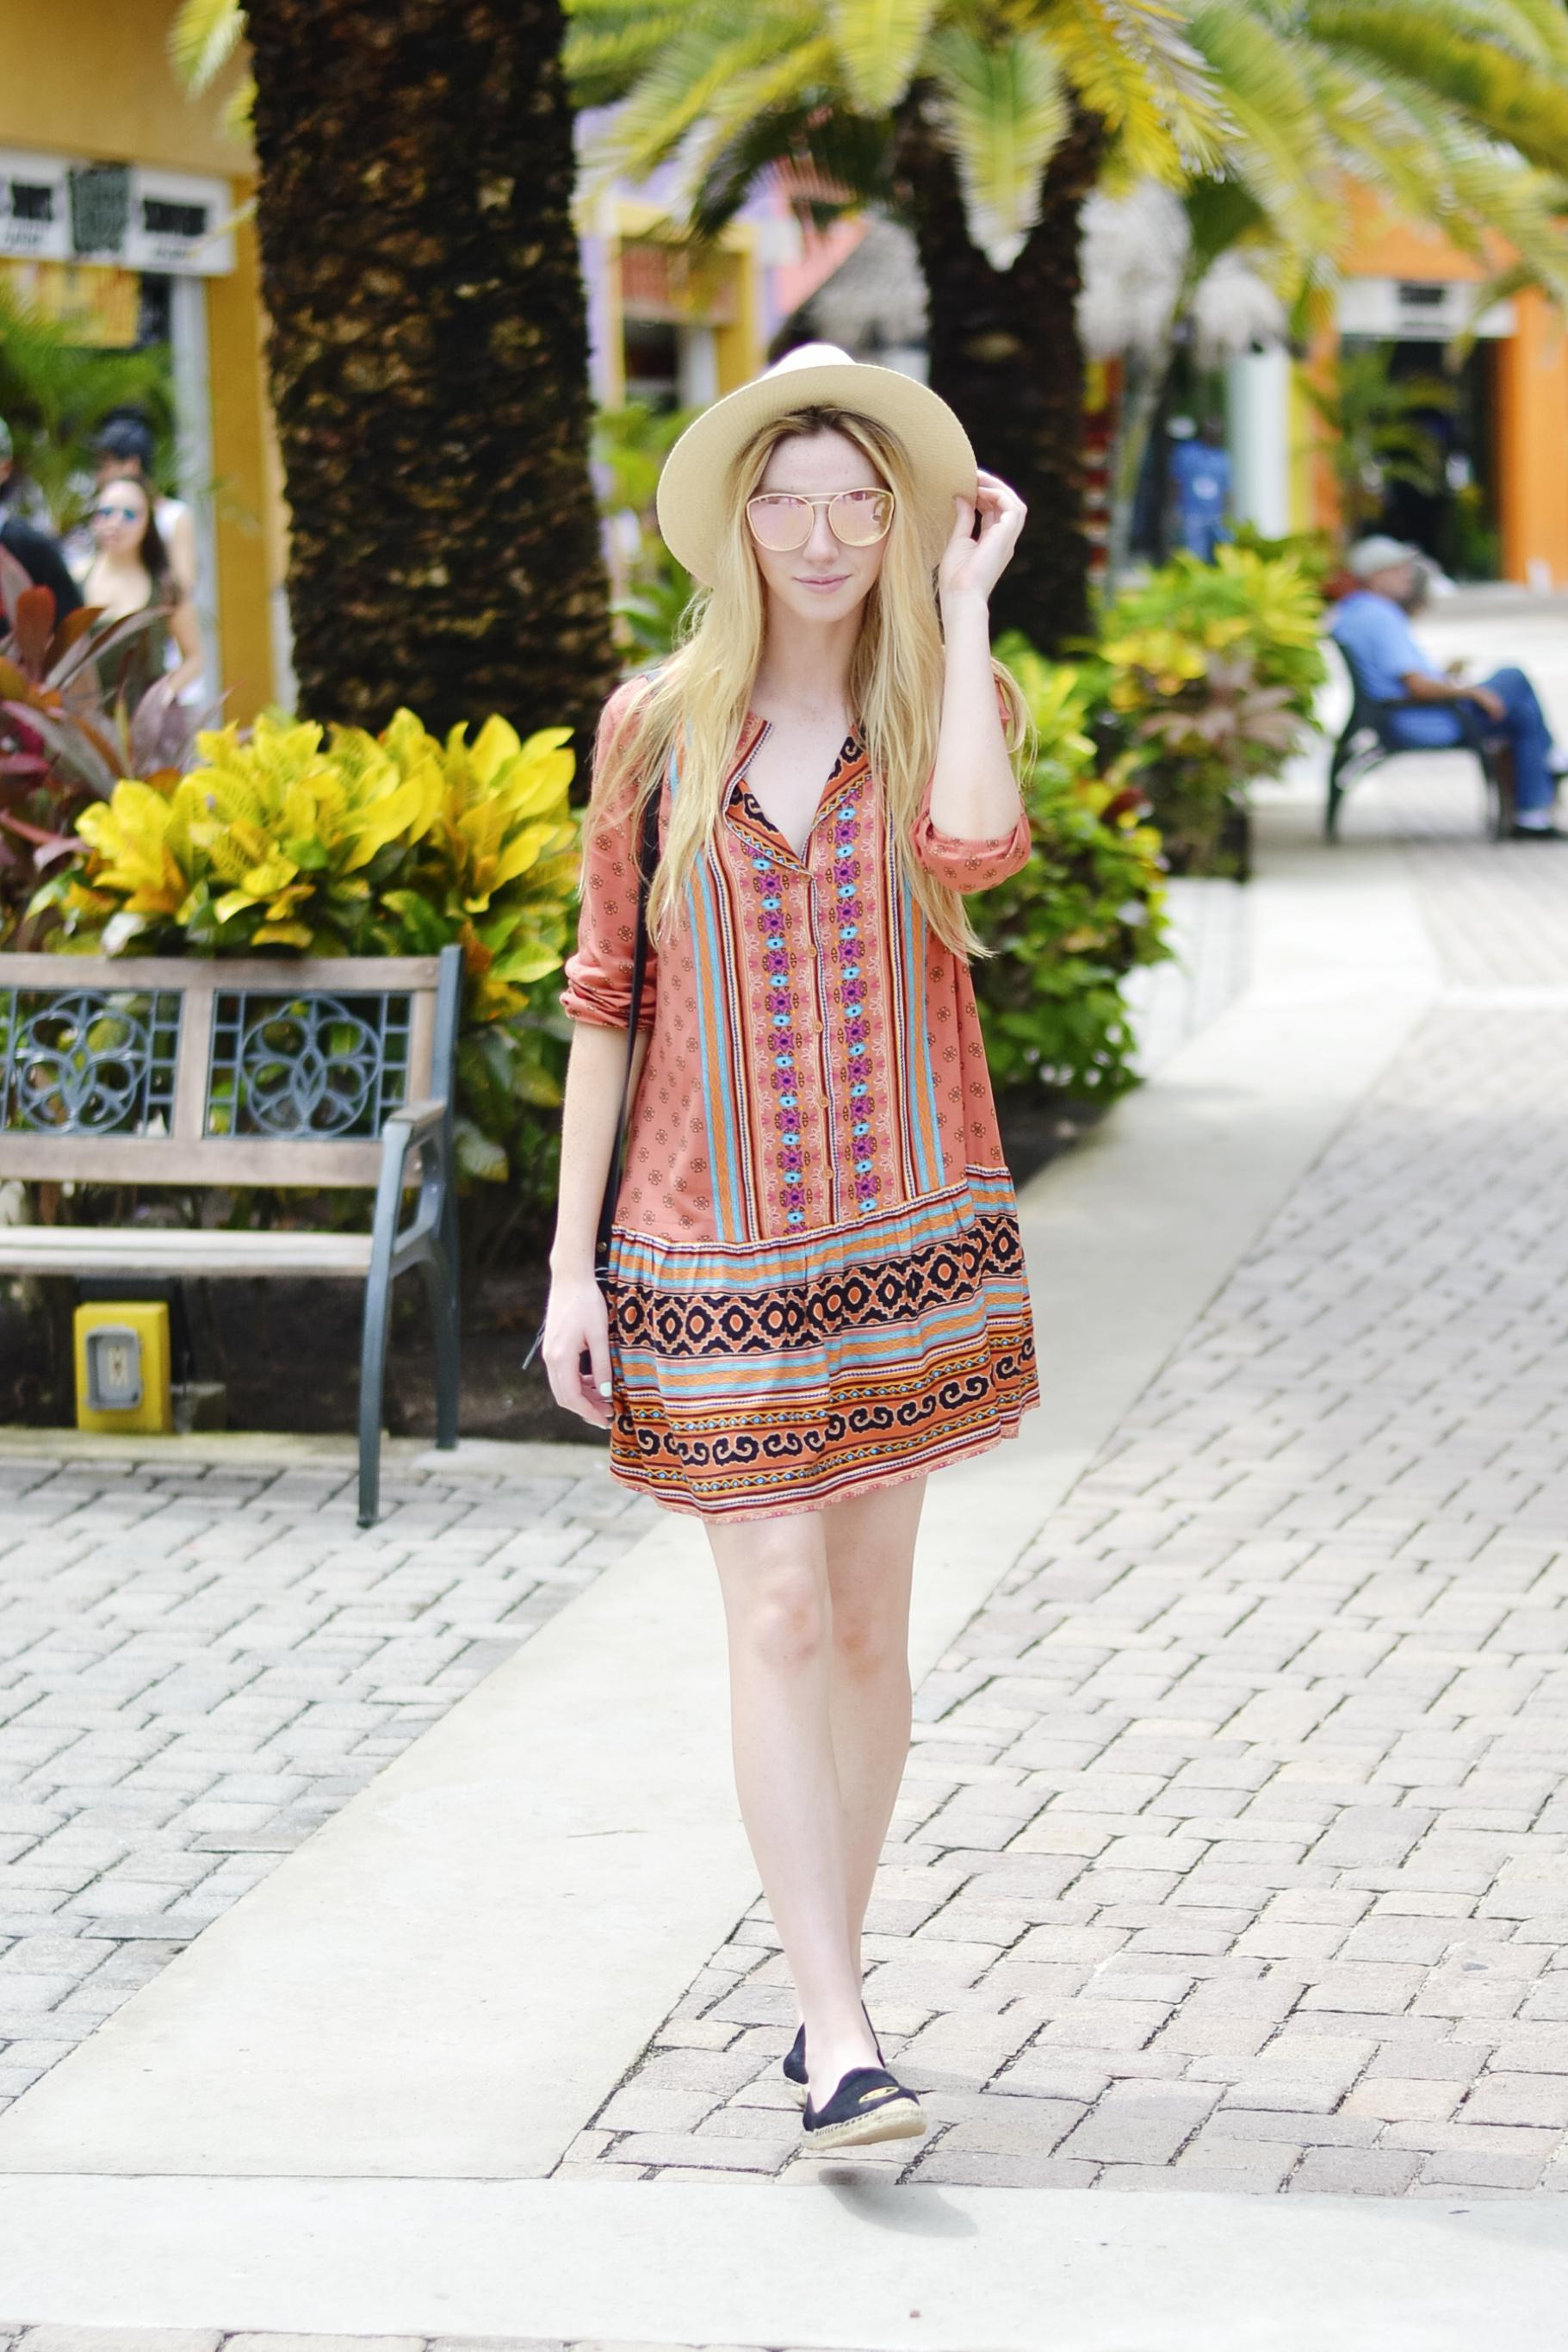 BB Dakota Dress Blogger (via Chic Now)